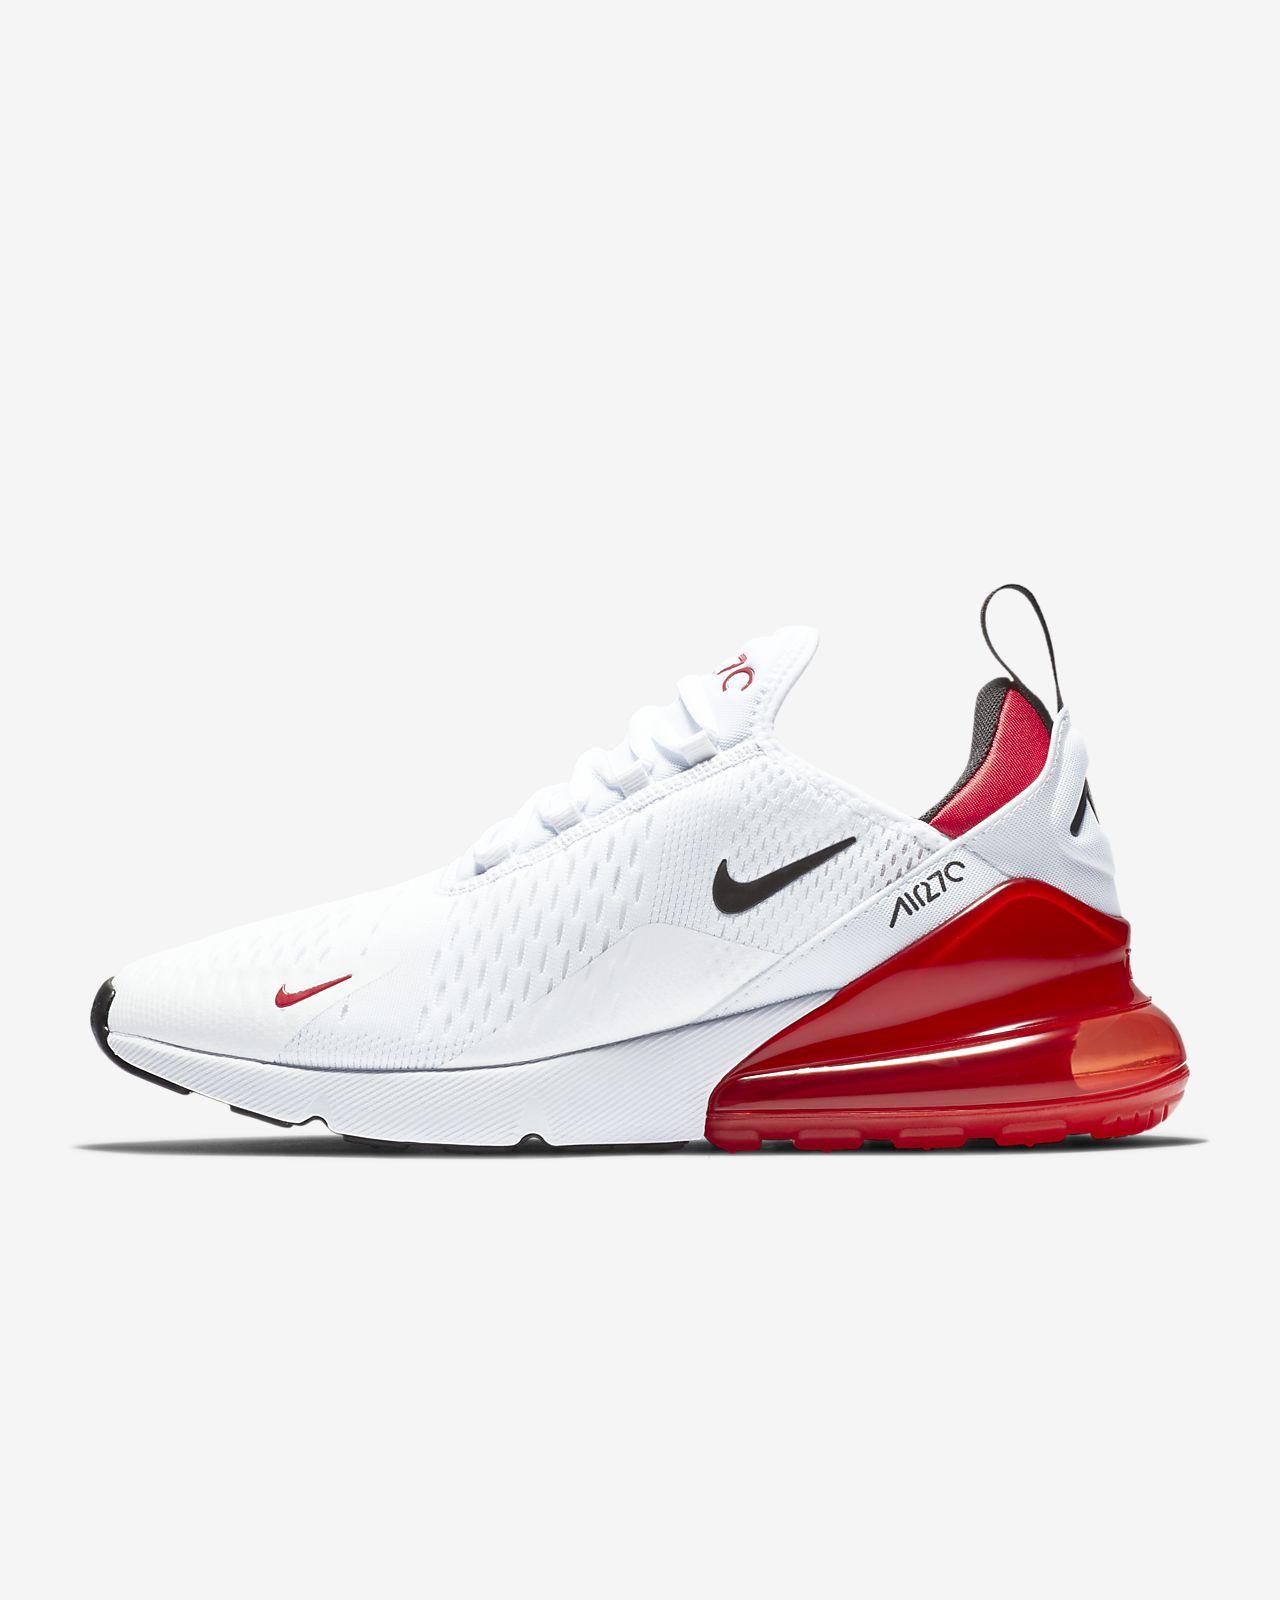 best sneakers c8e0c 60ec4 ... Nike Air Max 270 sko til herre